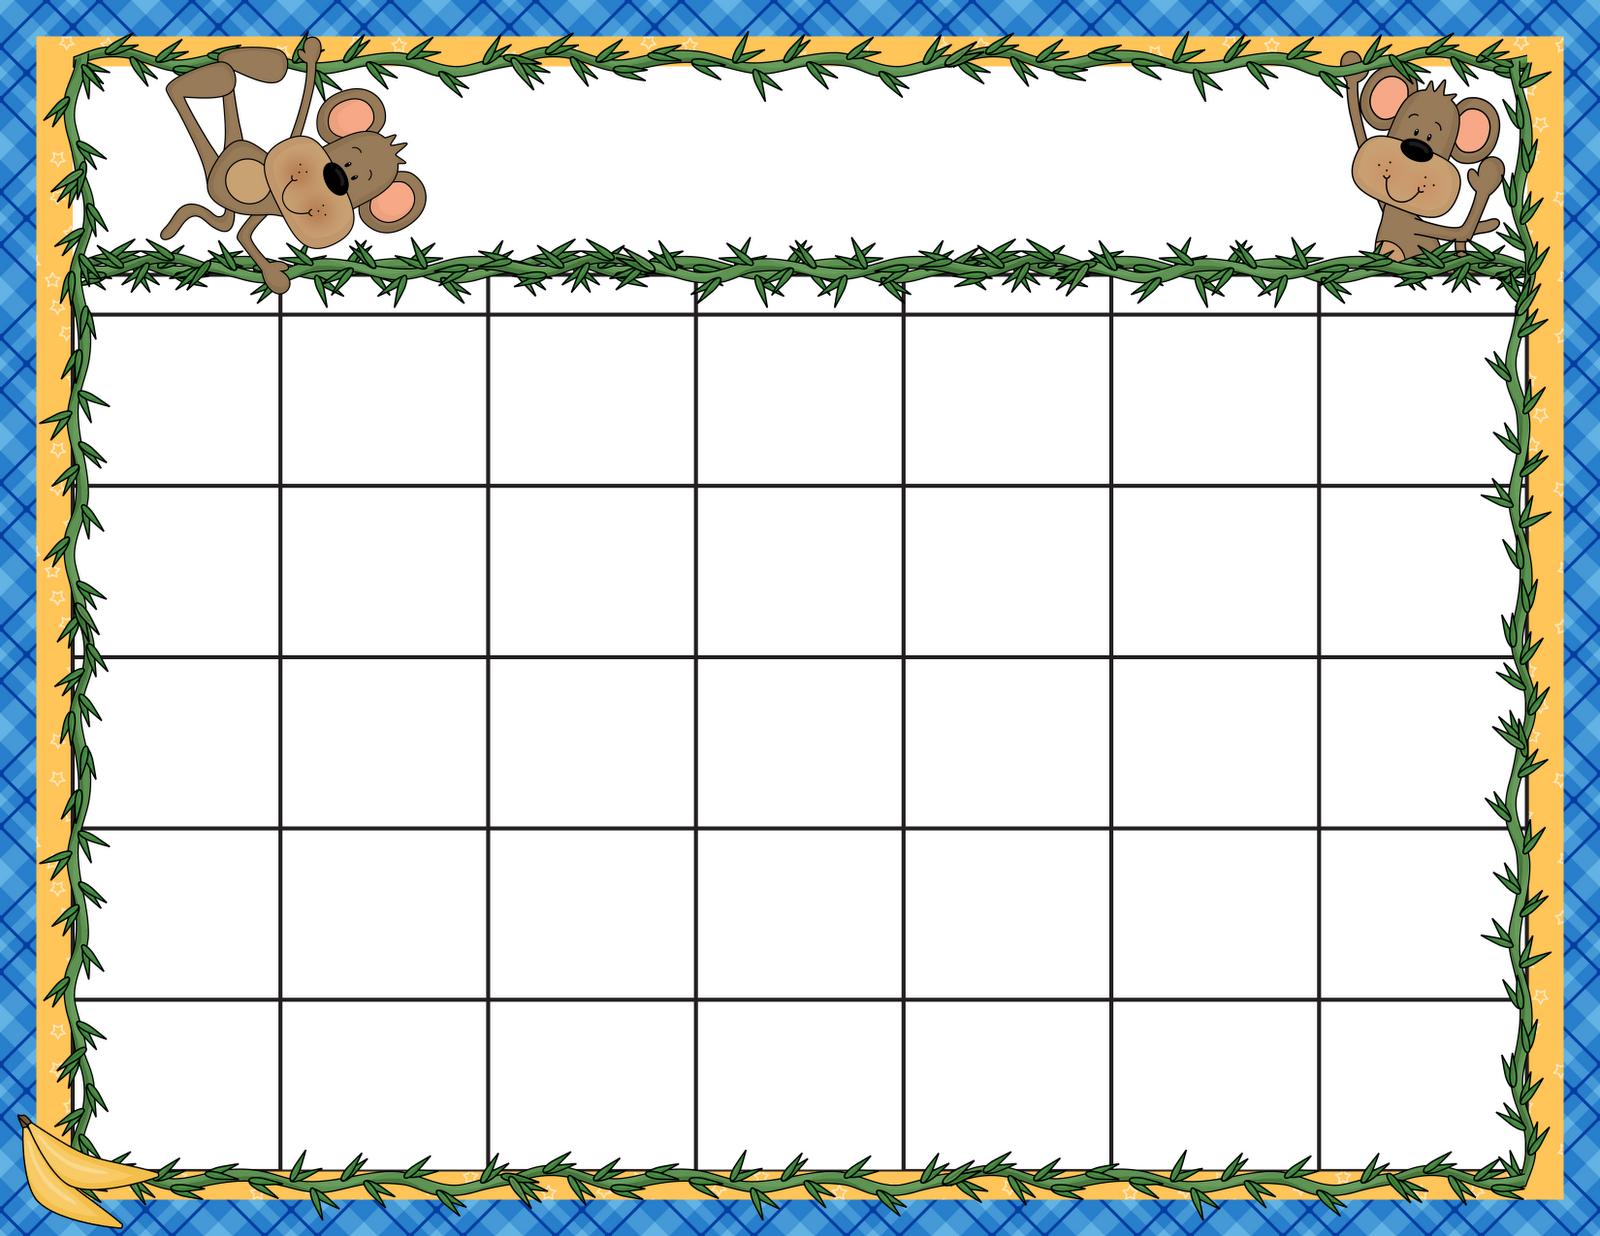 6 Images of Preschool Printable Calendar 2014